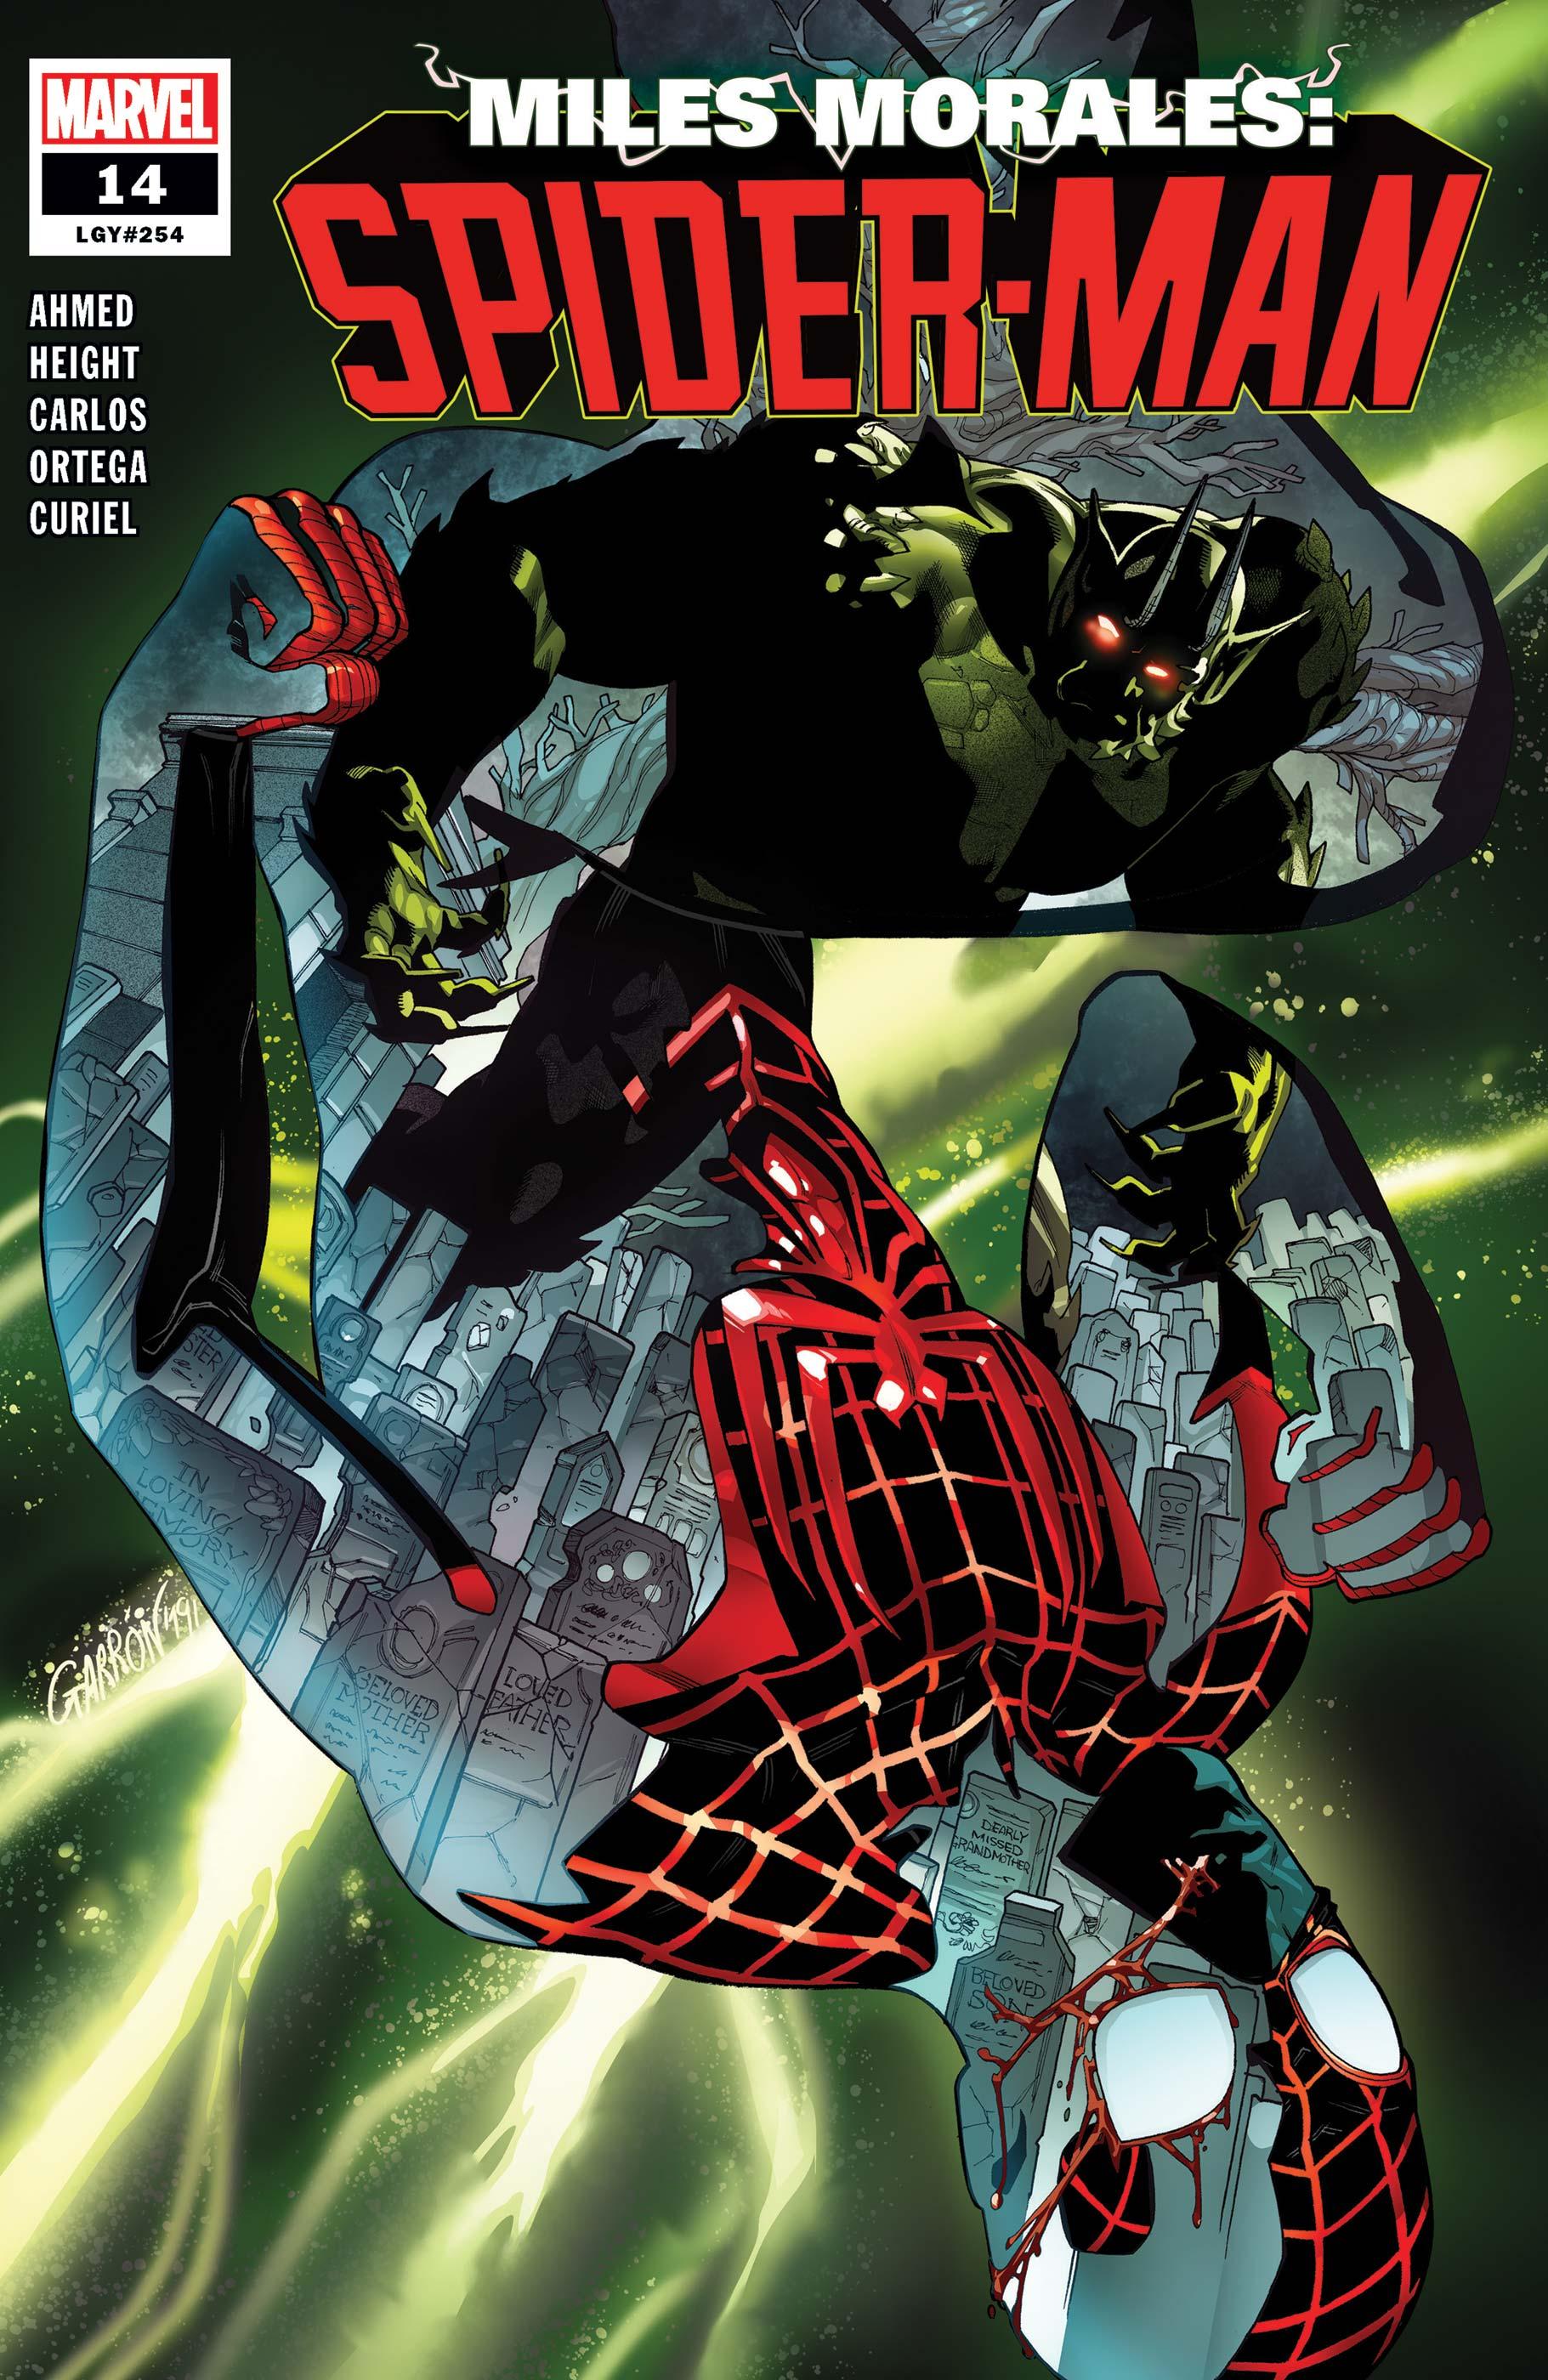 Miles Morales: Spider-Man (2018) #14